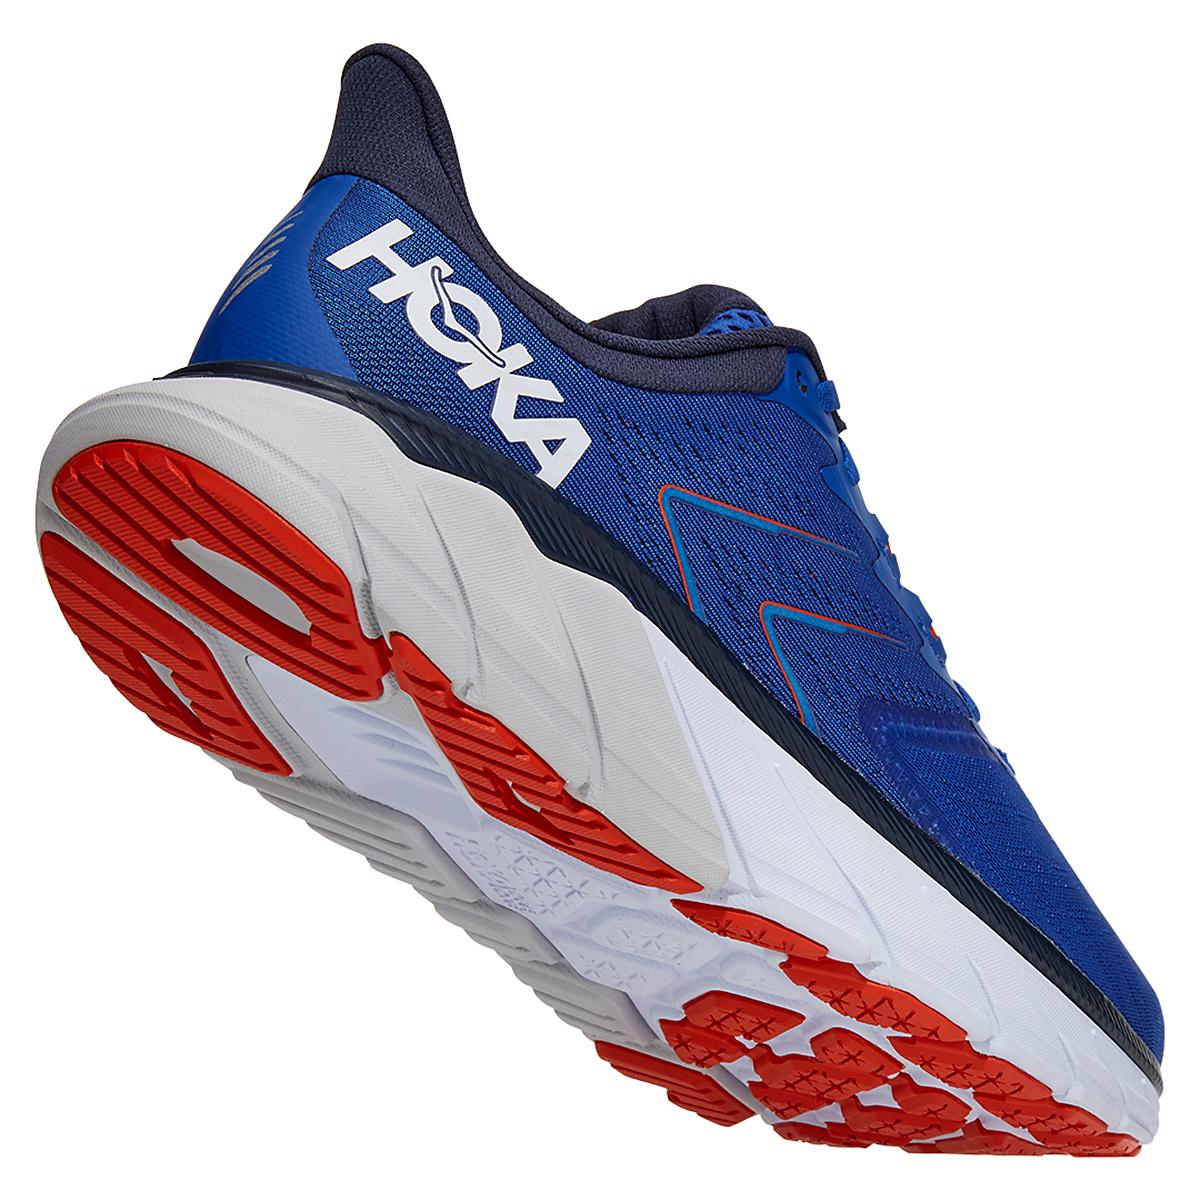 Men's Hoka One One Arahi 5 Running Shoe - Color: Turkish Sea/White - Size: 7 - Width: Regular, Turkish Sea/White, large, image 3